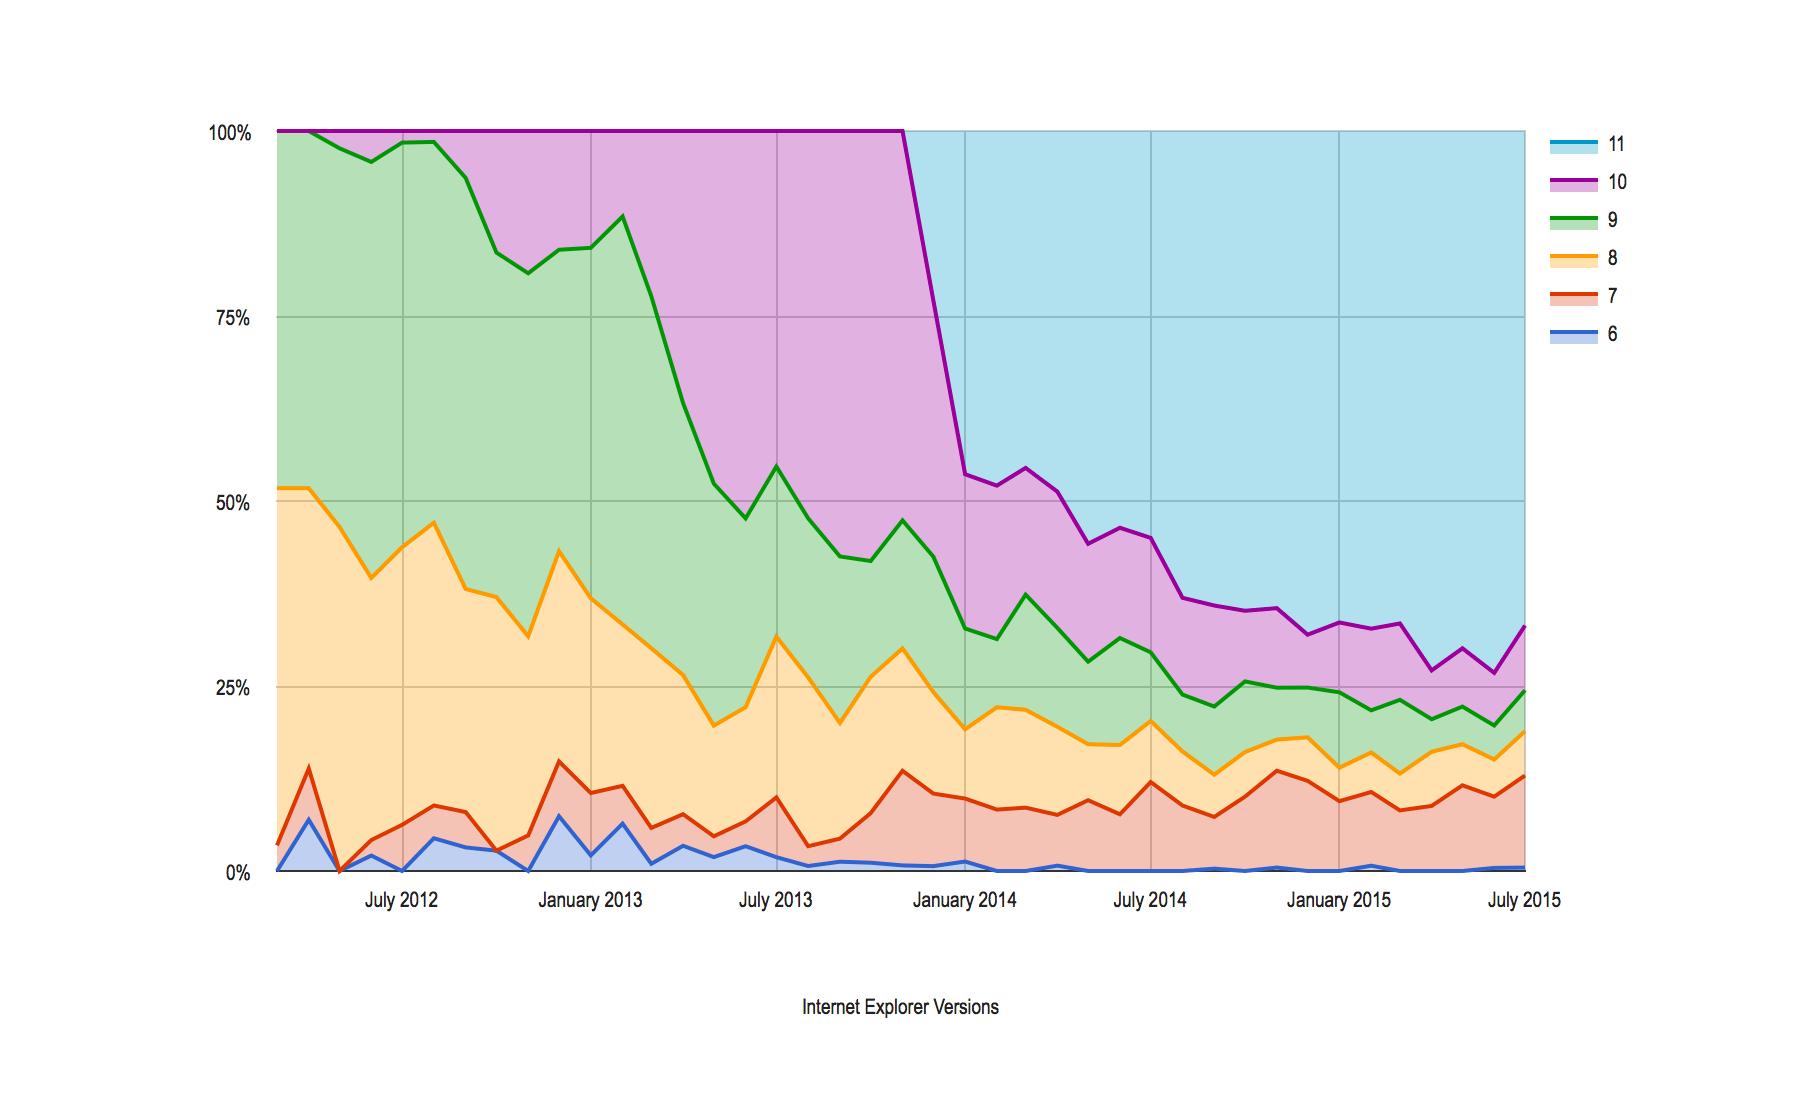 Internet Explorer Versions on Bootswatch